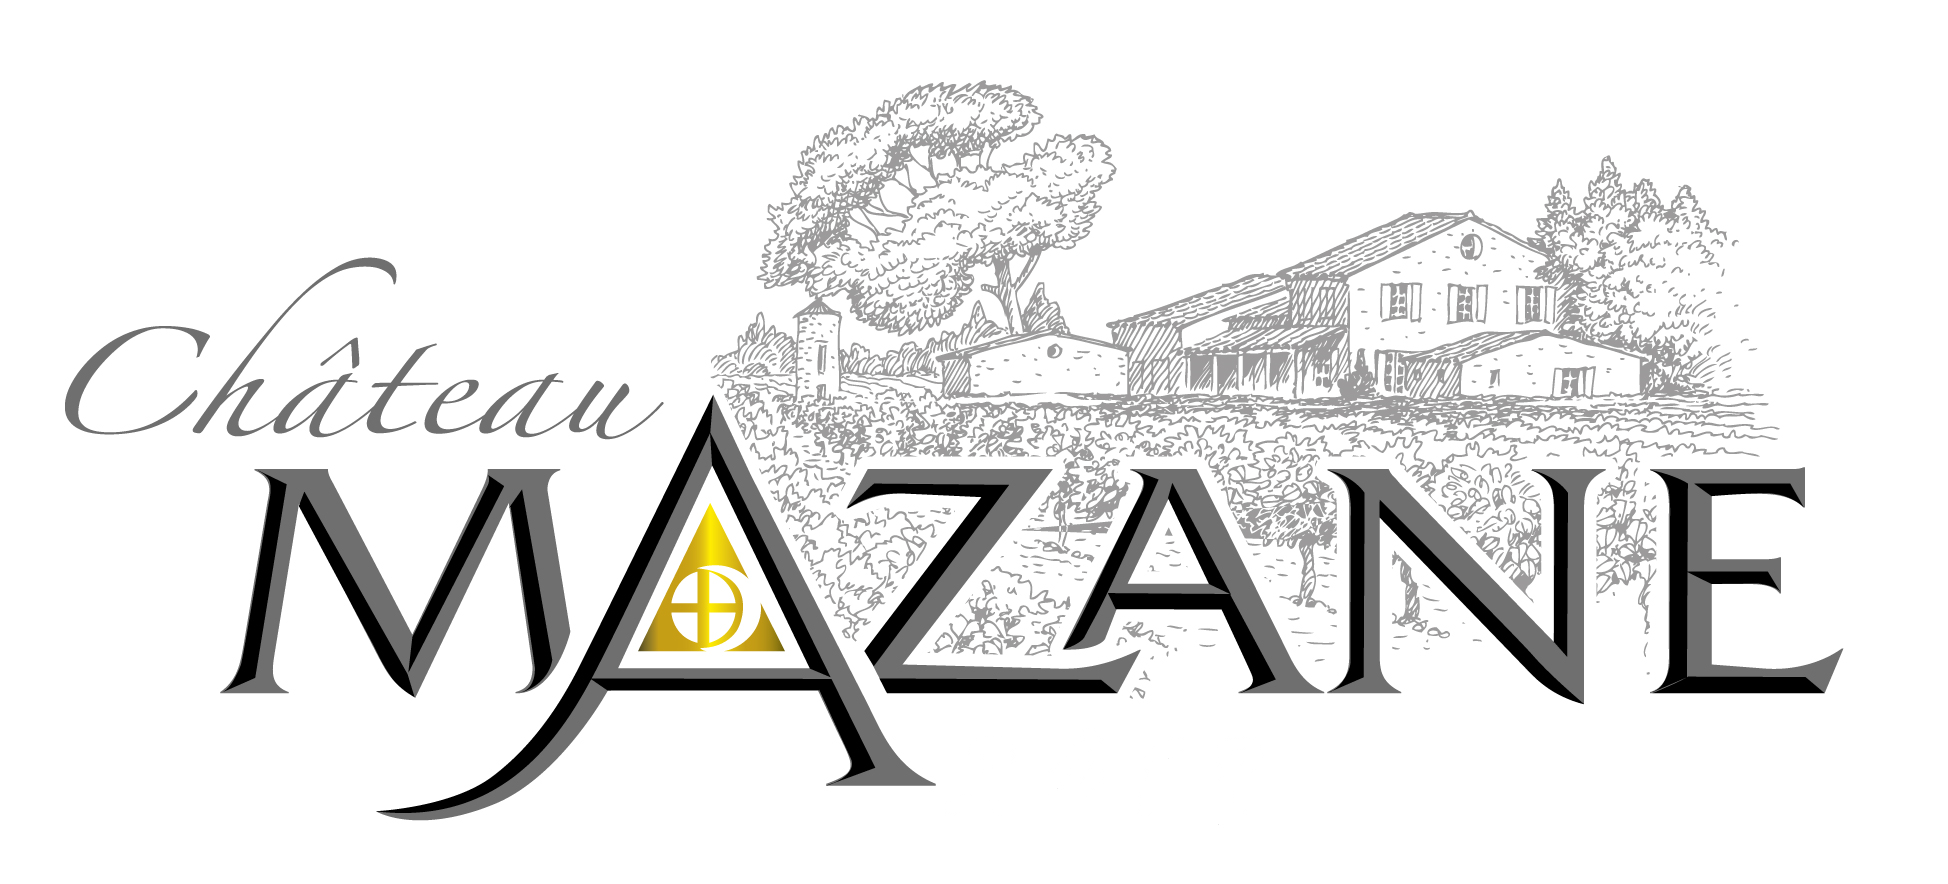 Gite Chateau Mazane